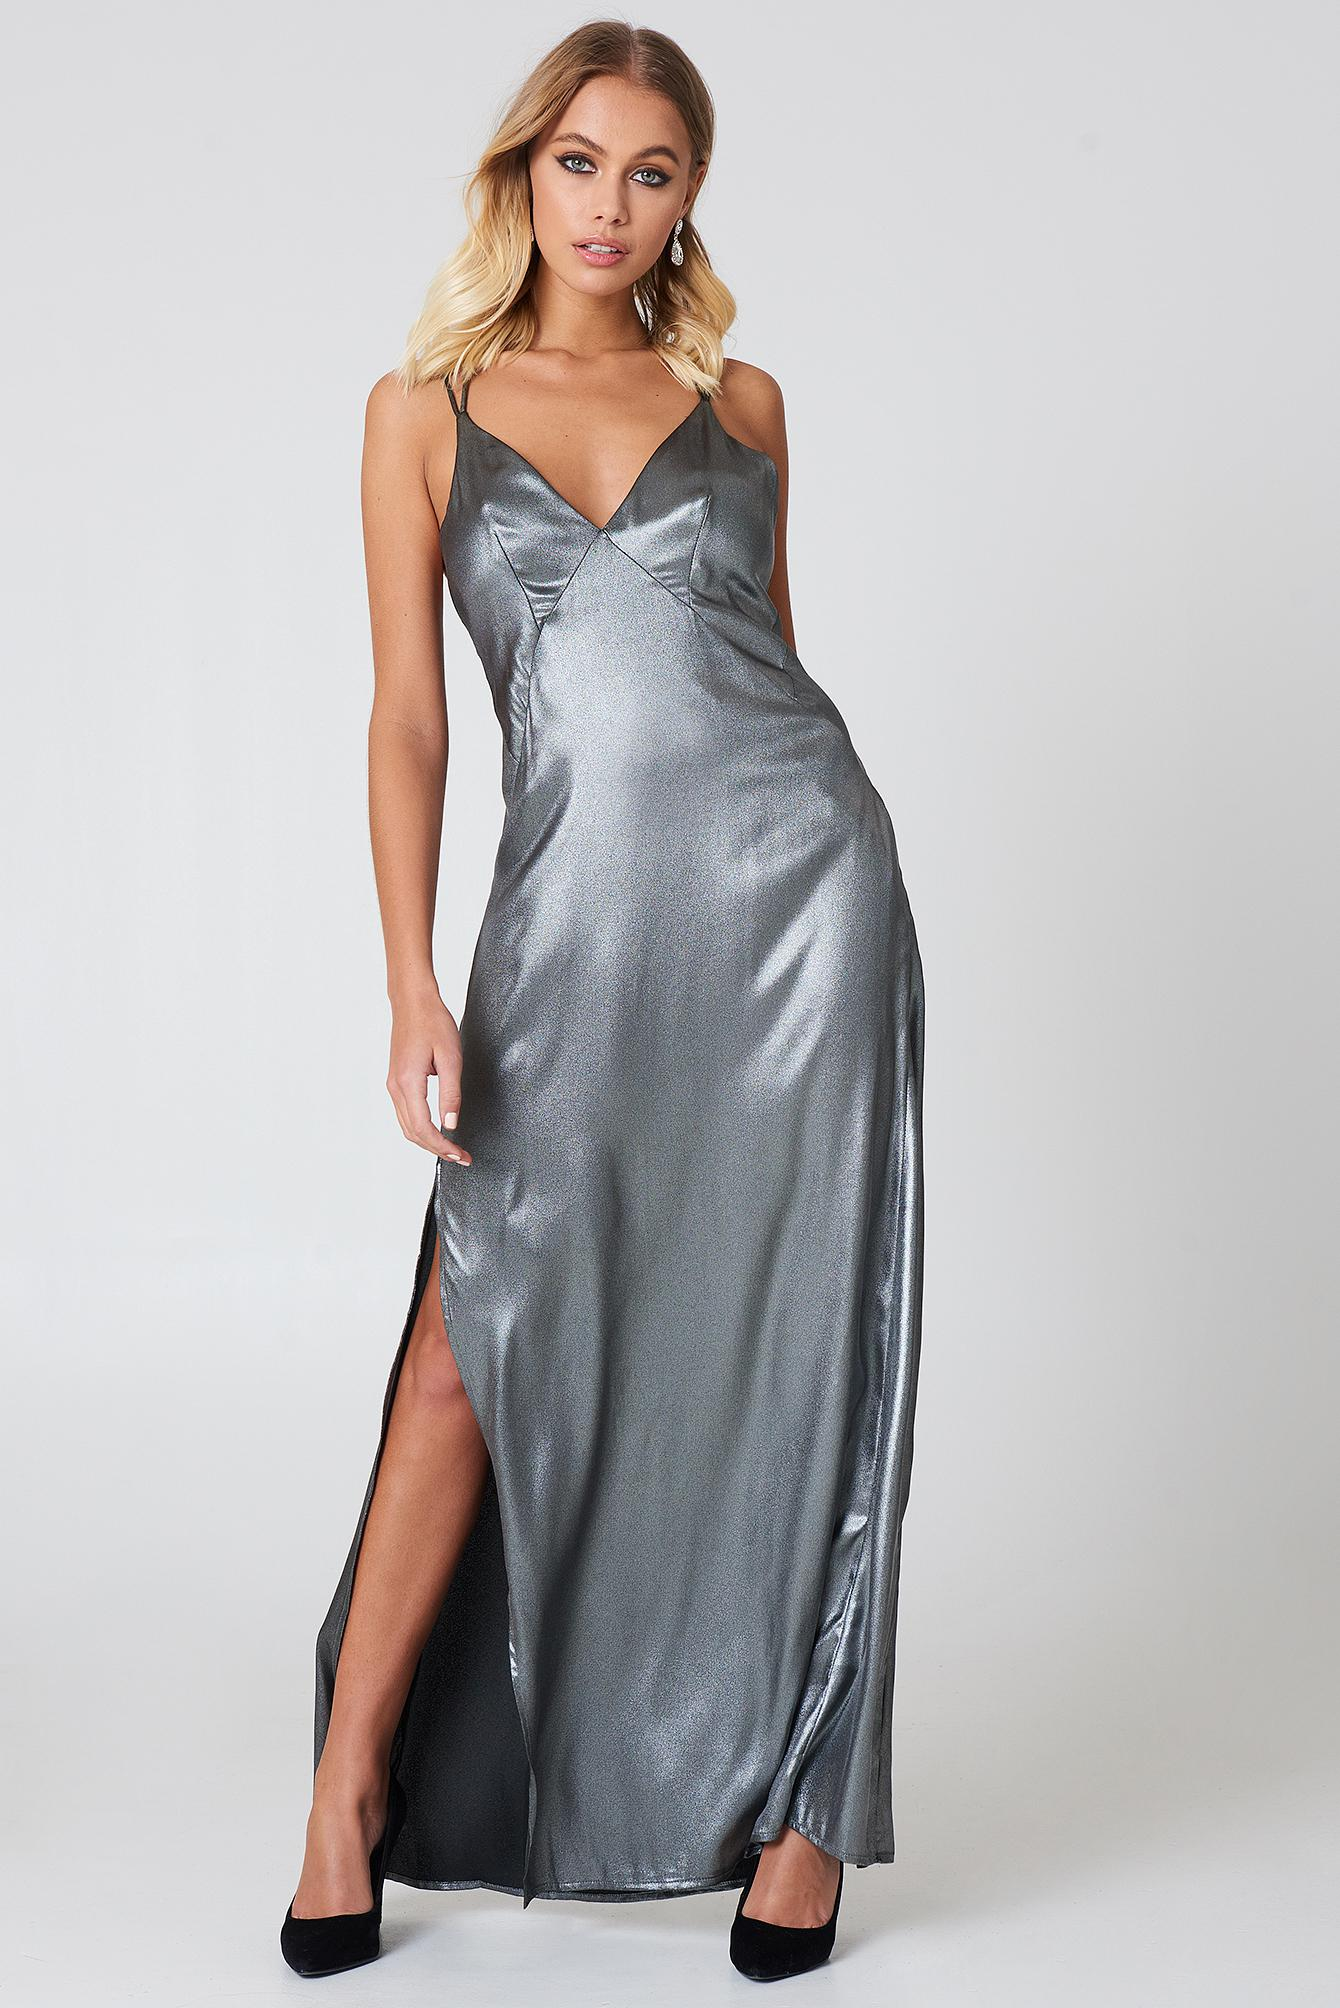 50c774f4127 Lyst - Astr Raven Dress Gunmetal